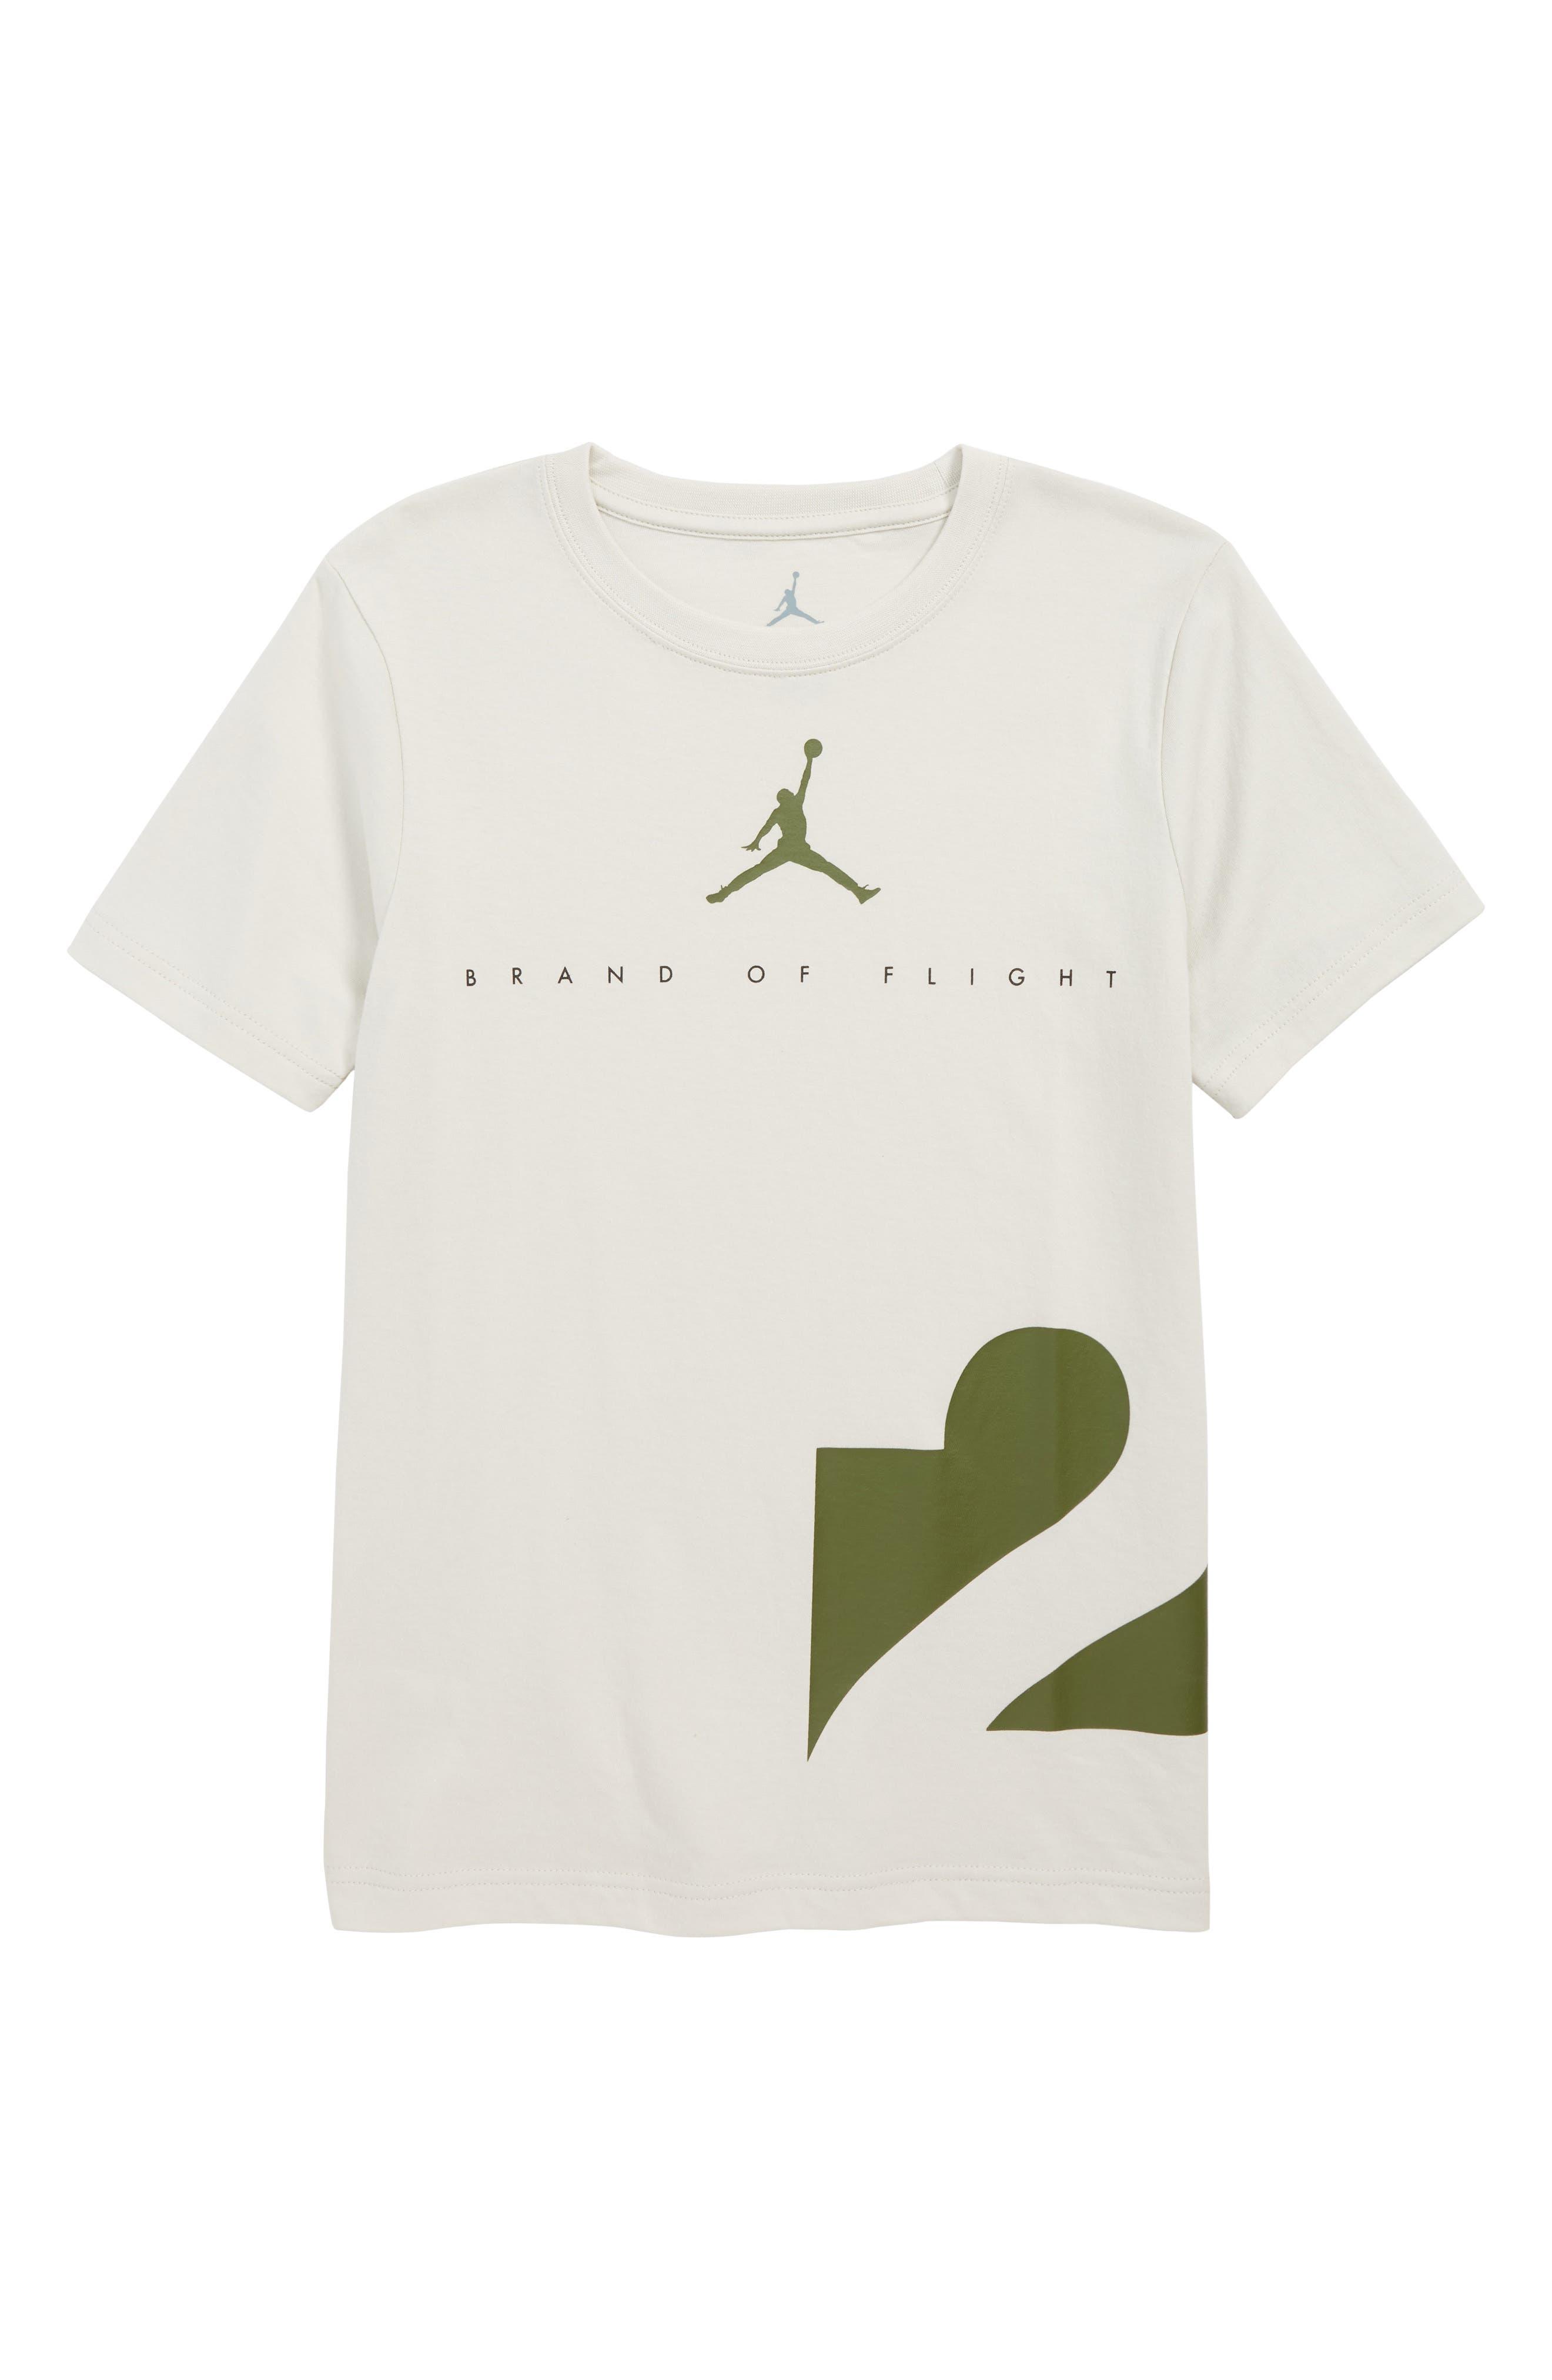 Jordan Two Three T-Shirt,                             Main thumbnail 1, color,                             LT BONE